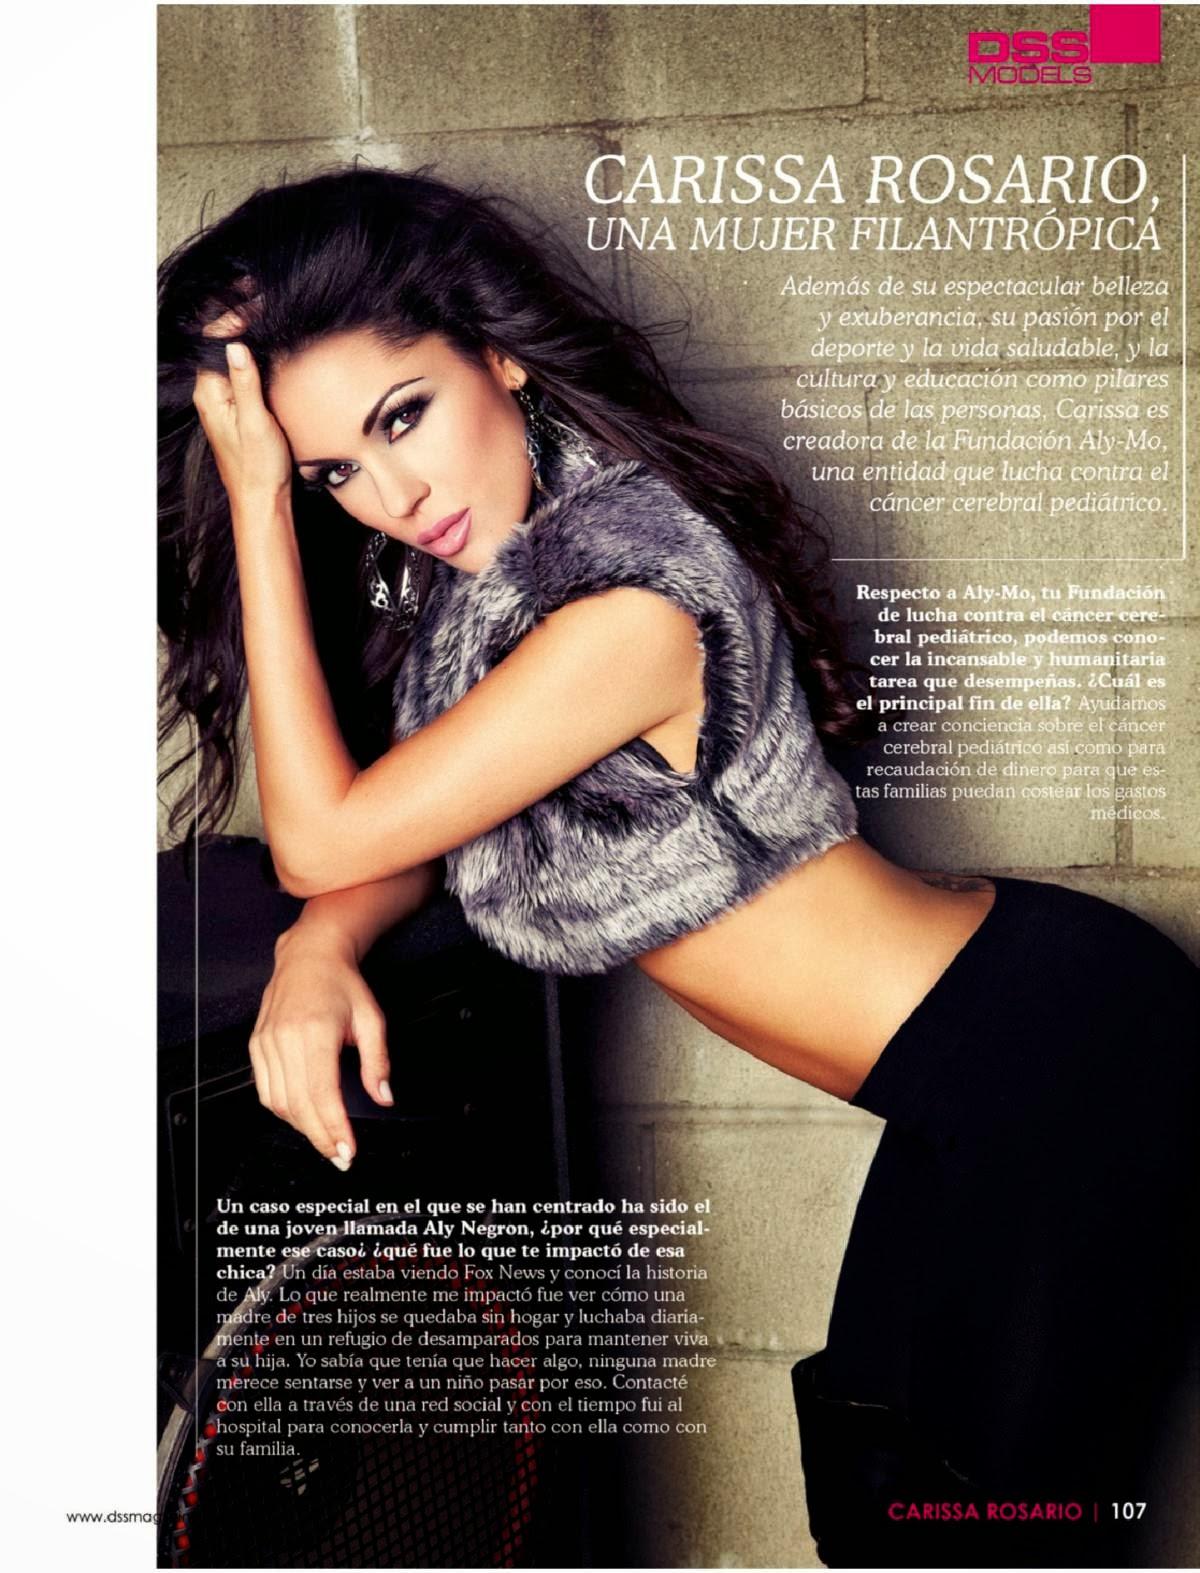 Magazine Photoshoot : Carissa Rosario Magazine Photoshoot for DSS Magazine December 2013